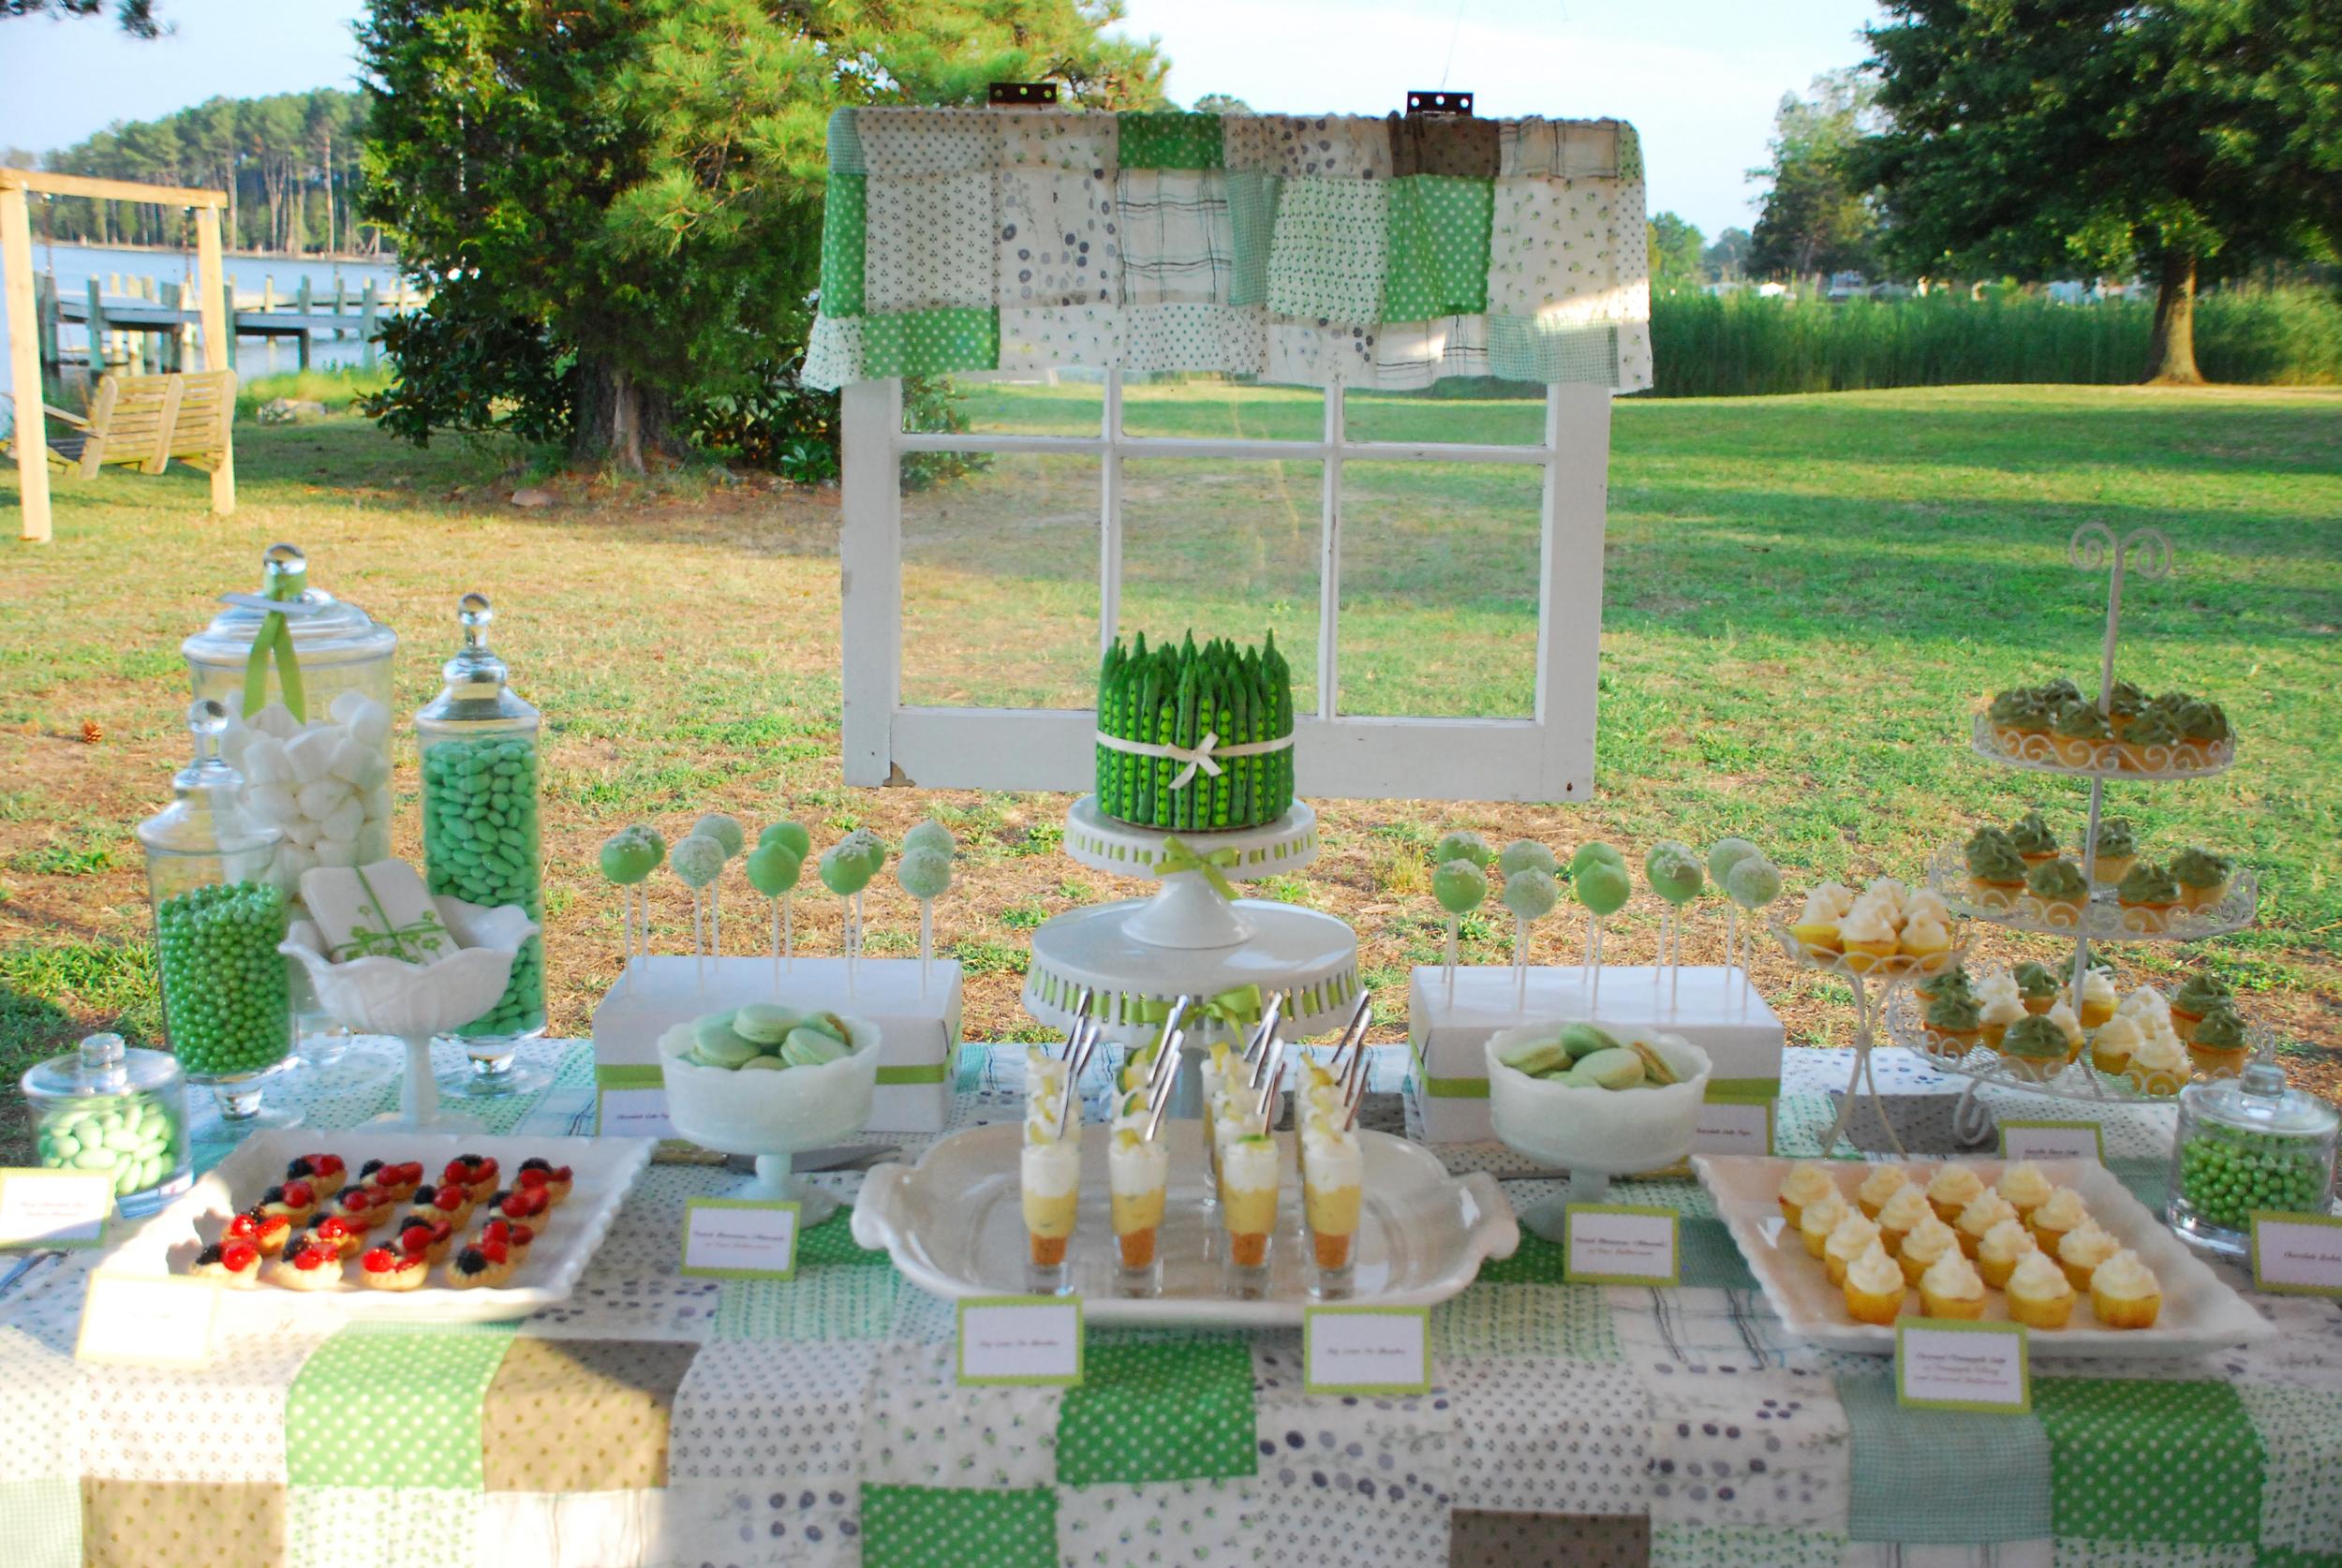 Green Bean Cake Mini Pies Dessert Table